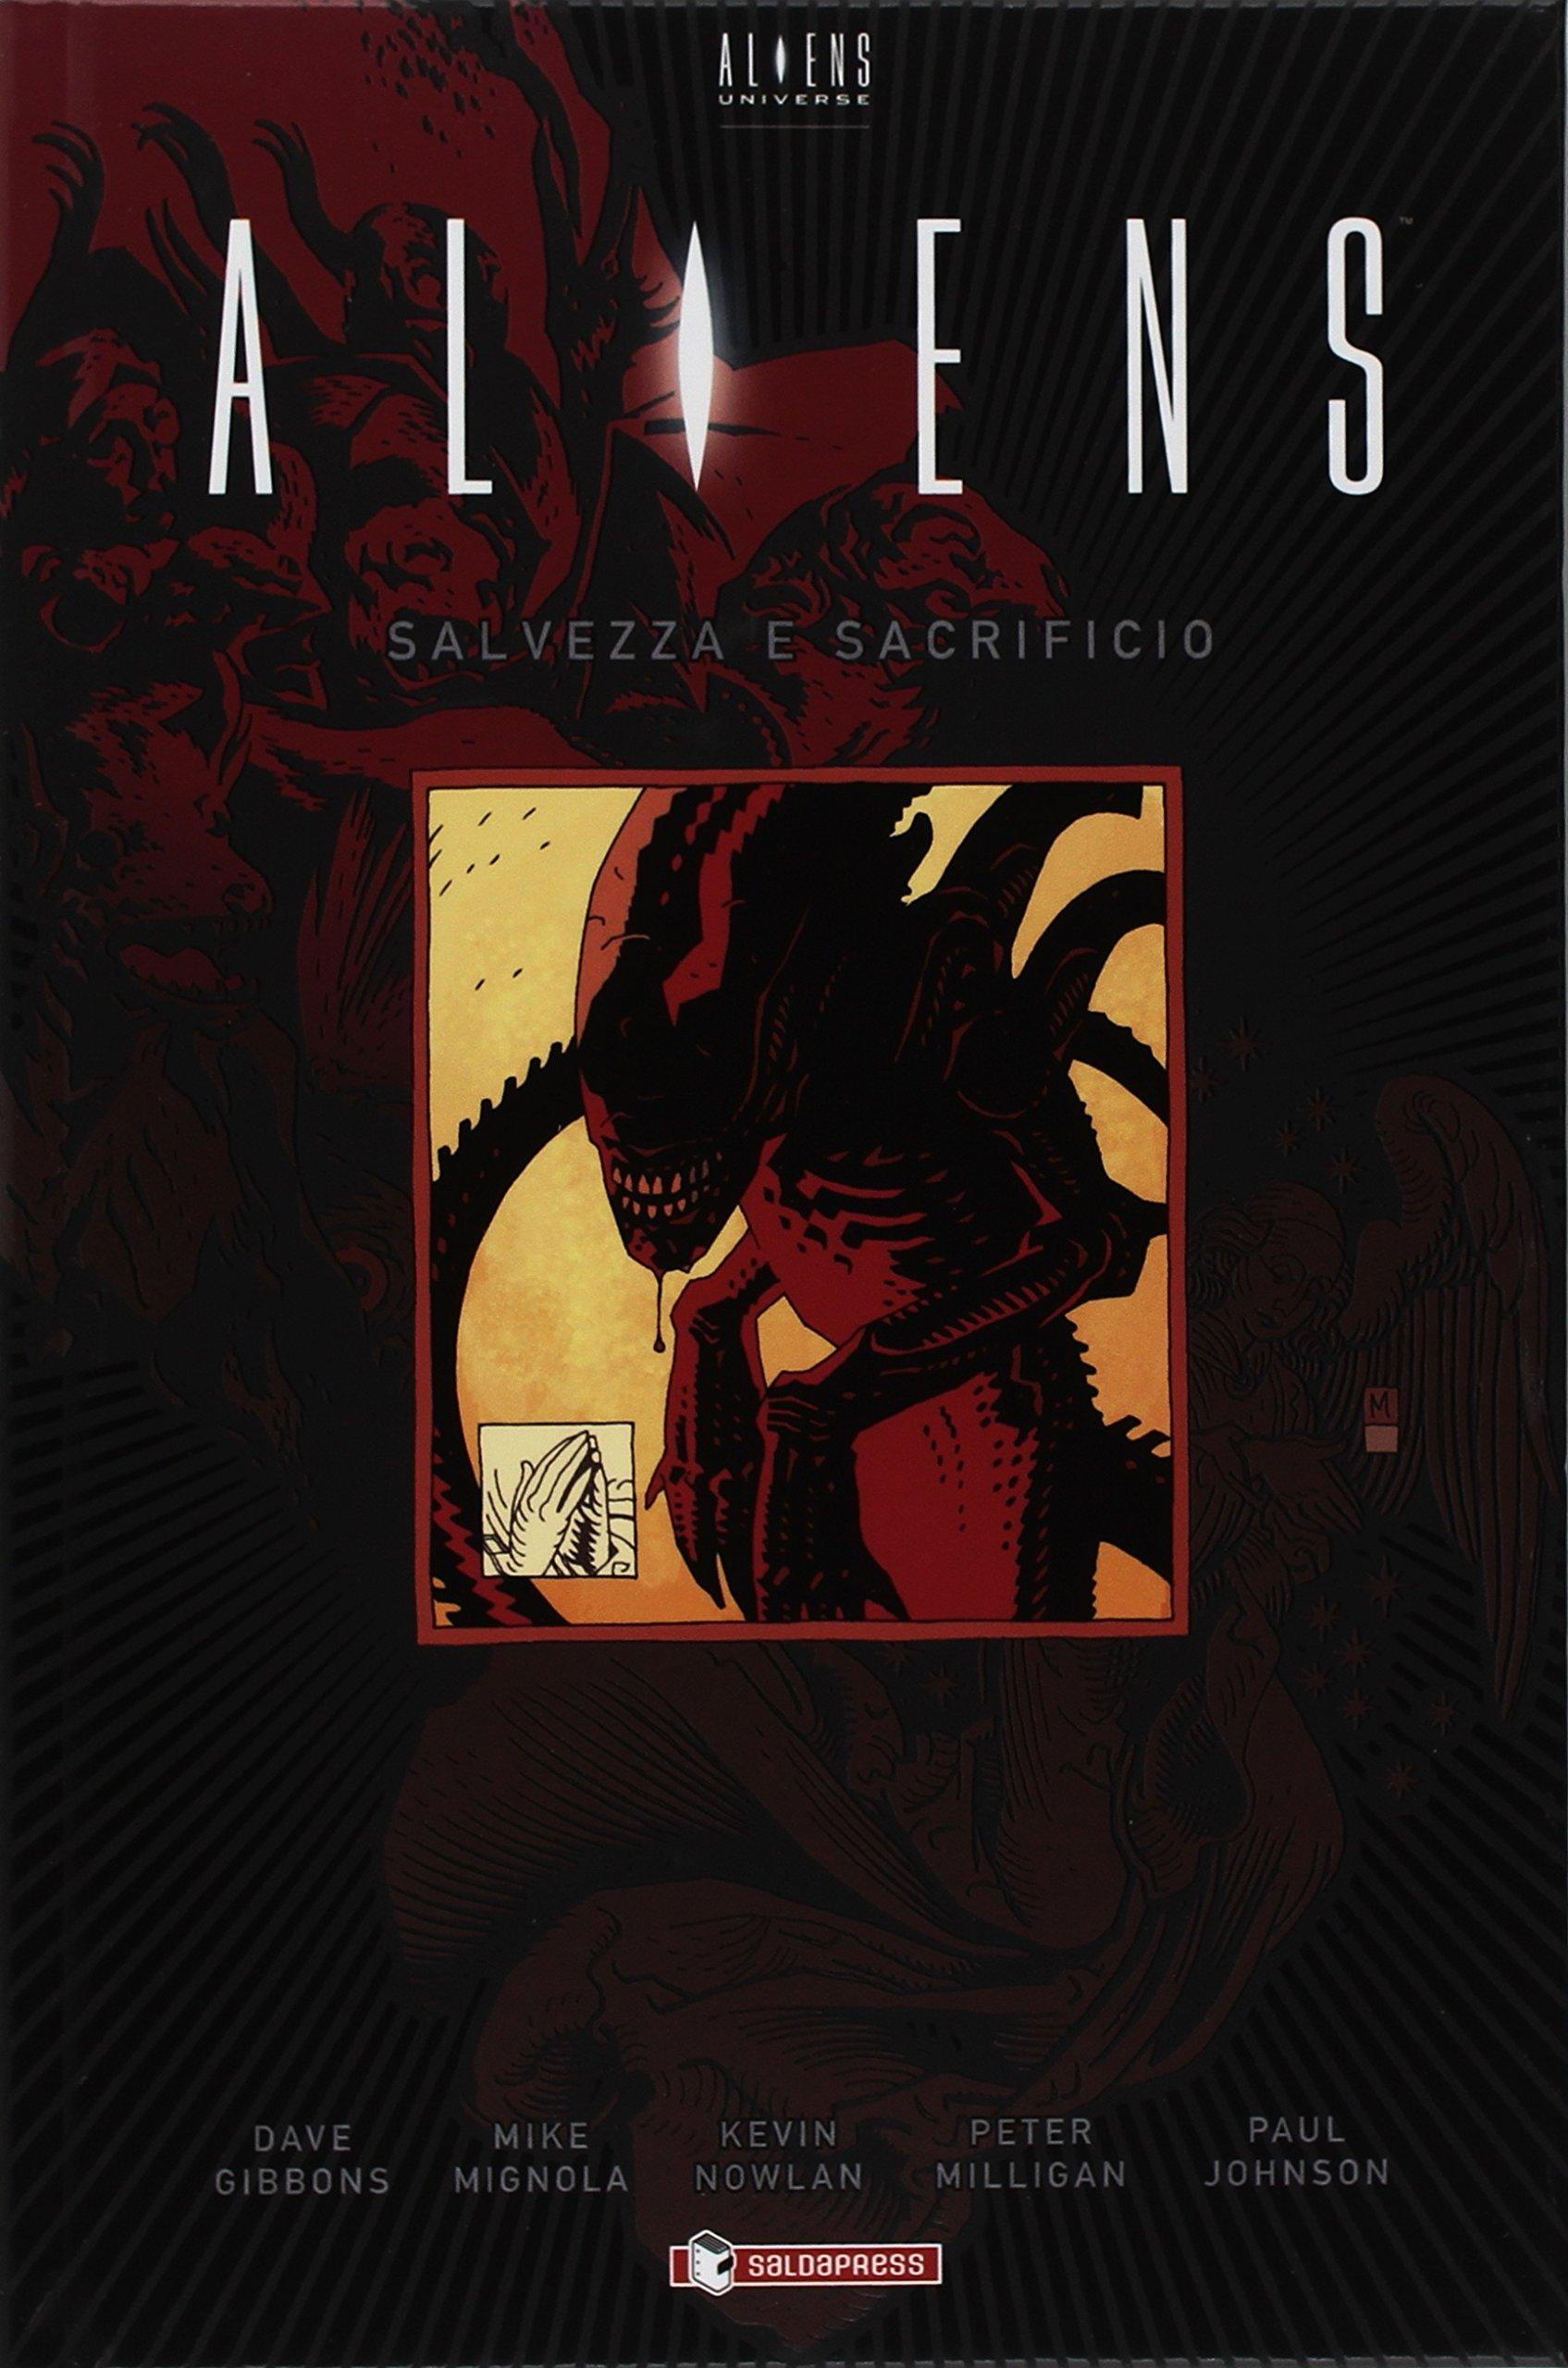 Aliens: salvezza e sacrificio Copertina rigida – 24 mag 2018 Dave Gibbons Mike Mignola Kevin Nowlan Peter Milligan